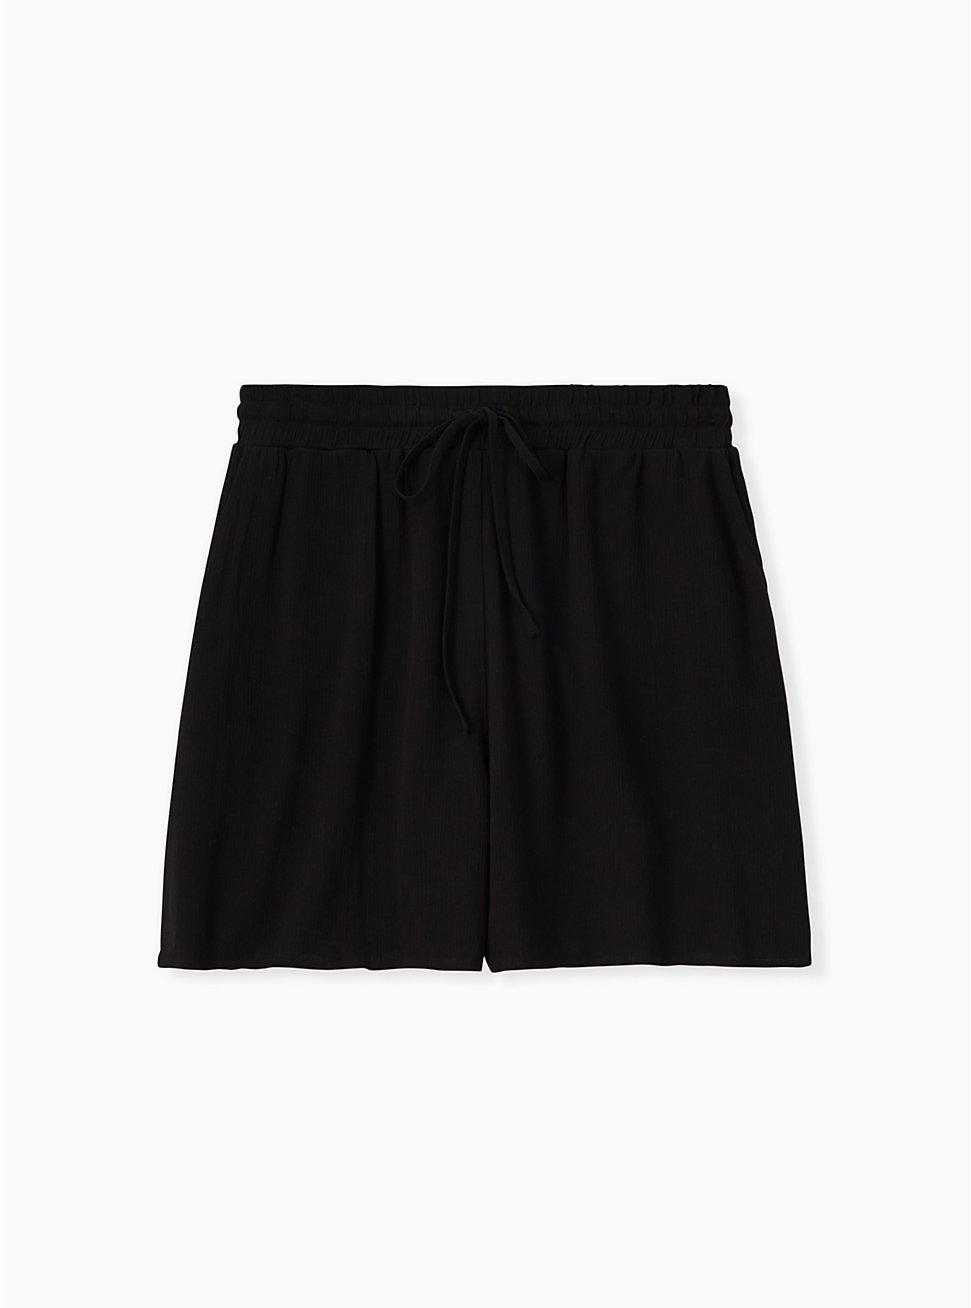 Drawstring Mid Short - Crinkle Gauze Black, DEEP BLACK, hi-res